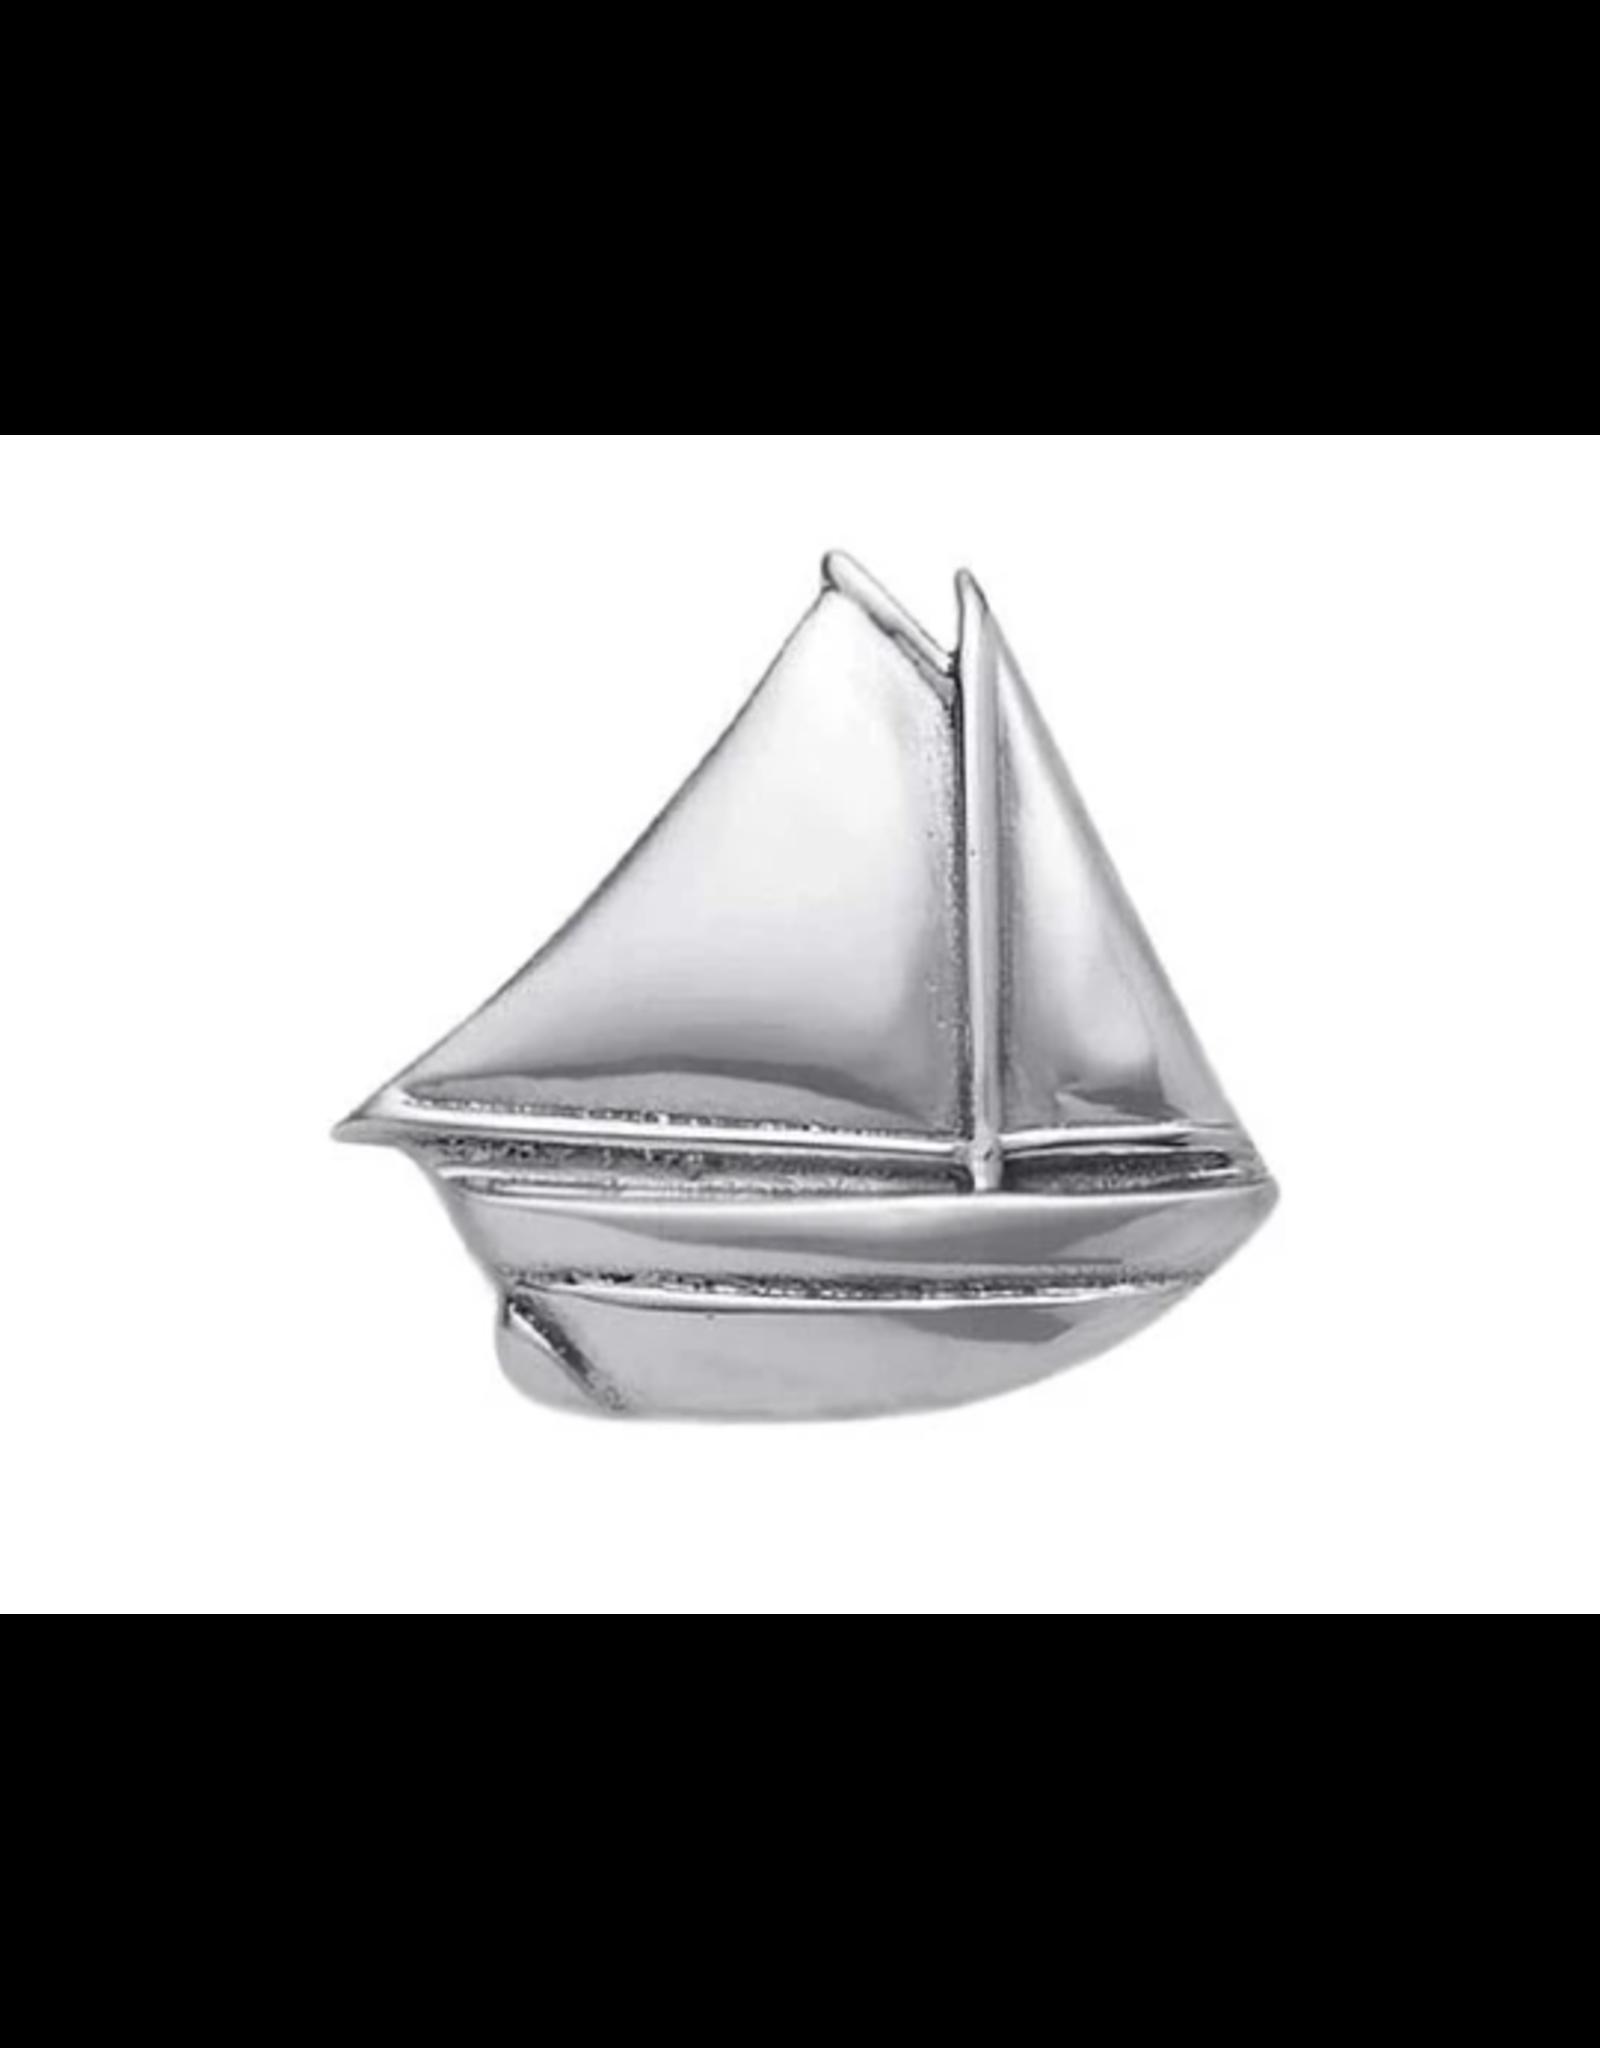 Mariposa Sailboat Napkin Weight